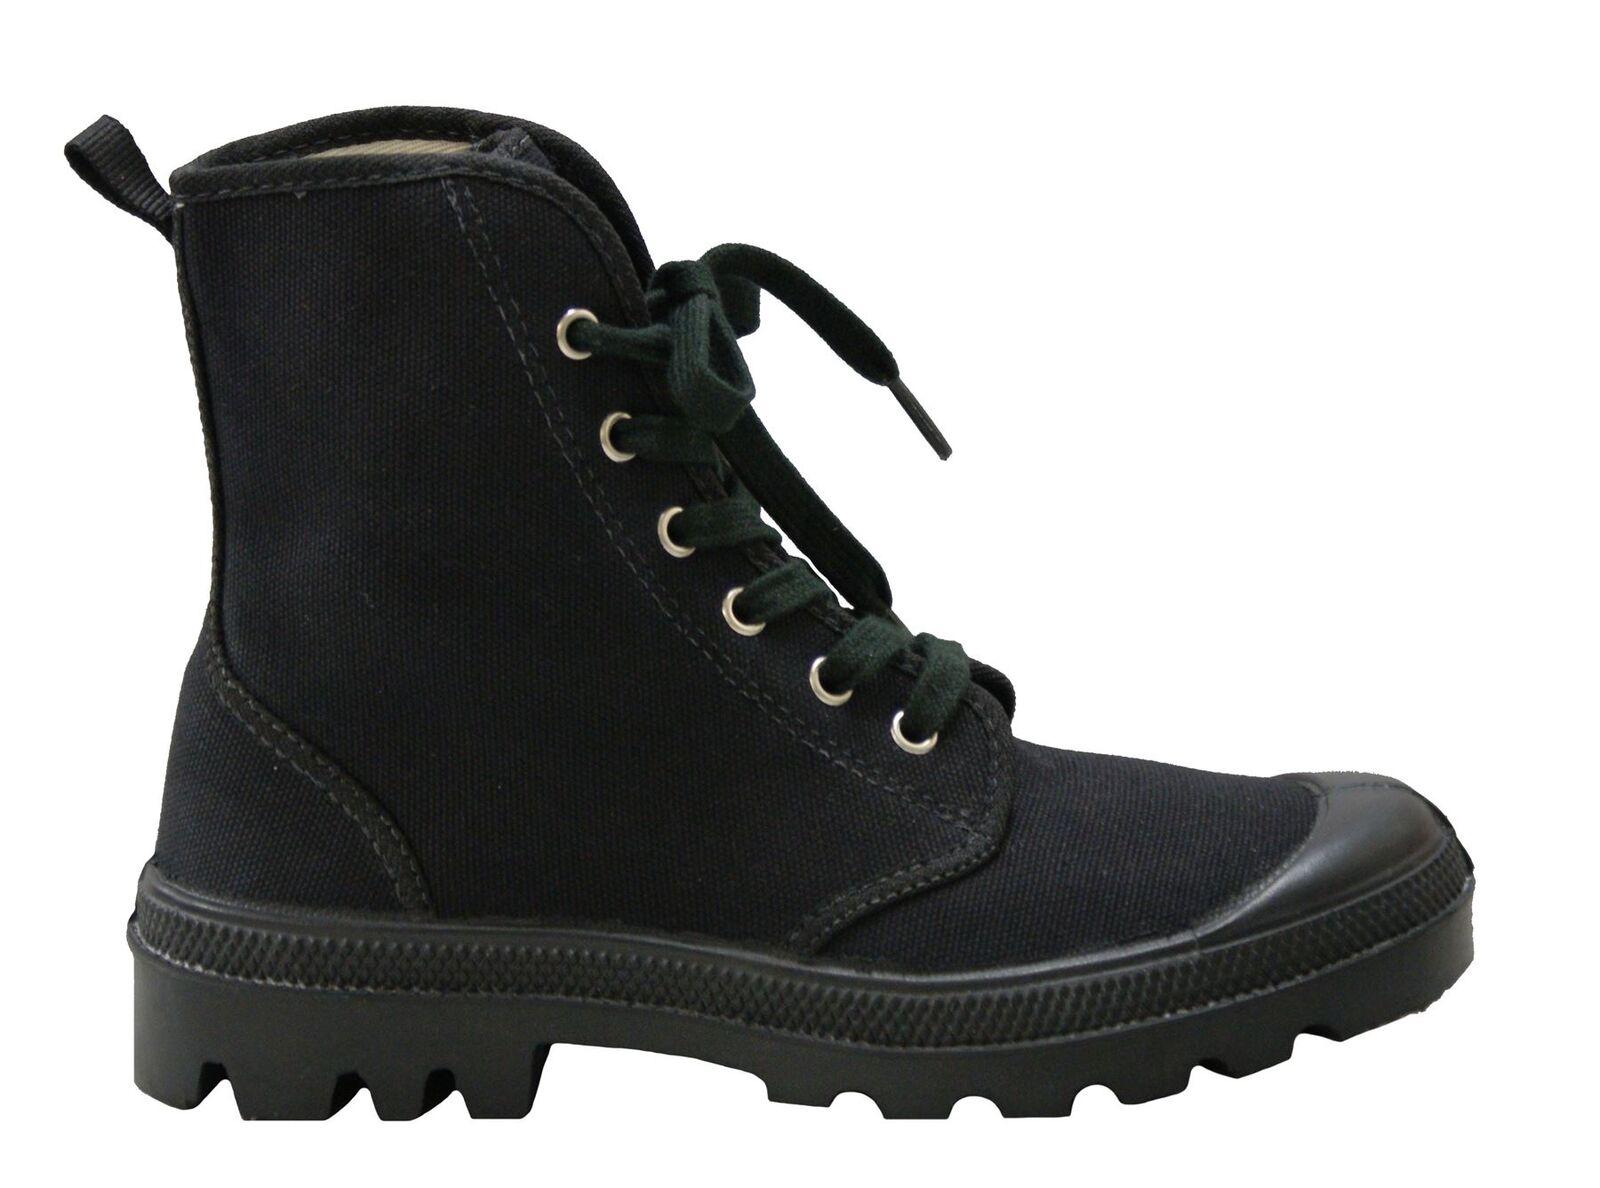 Palladium Style Unisex Pampa Footwear Fashionable Hi Top Pampa Unisex Canvas Stiefel e47871